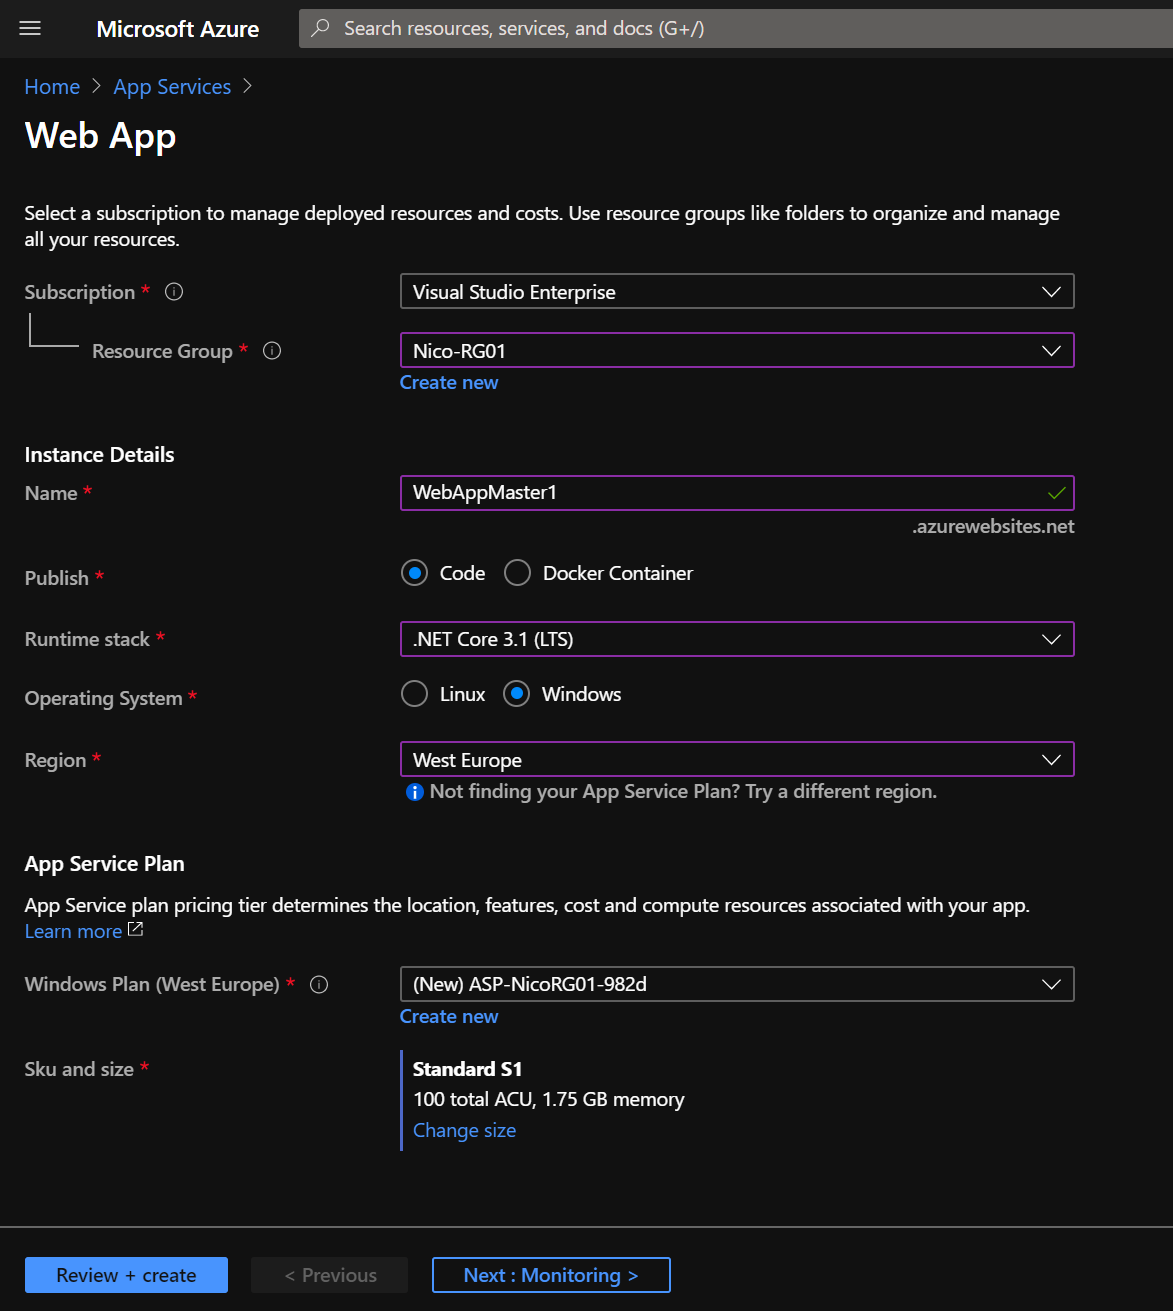 WebAppMaster1